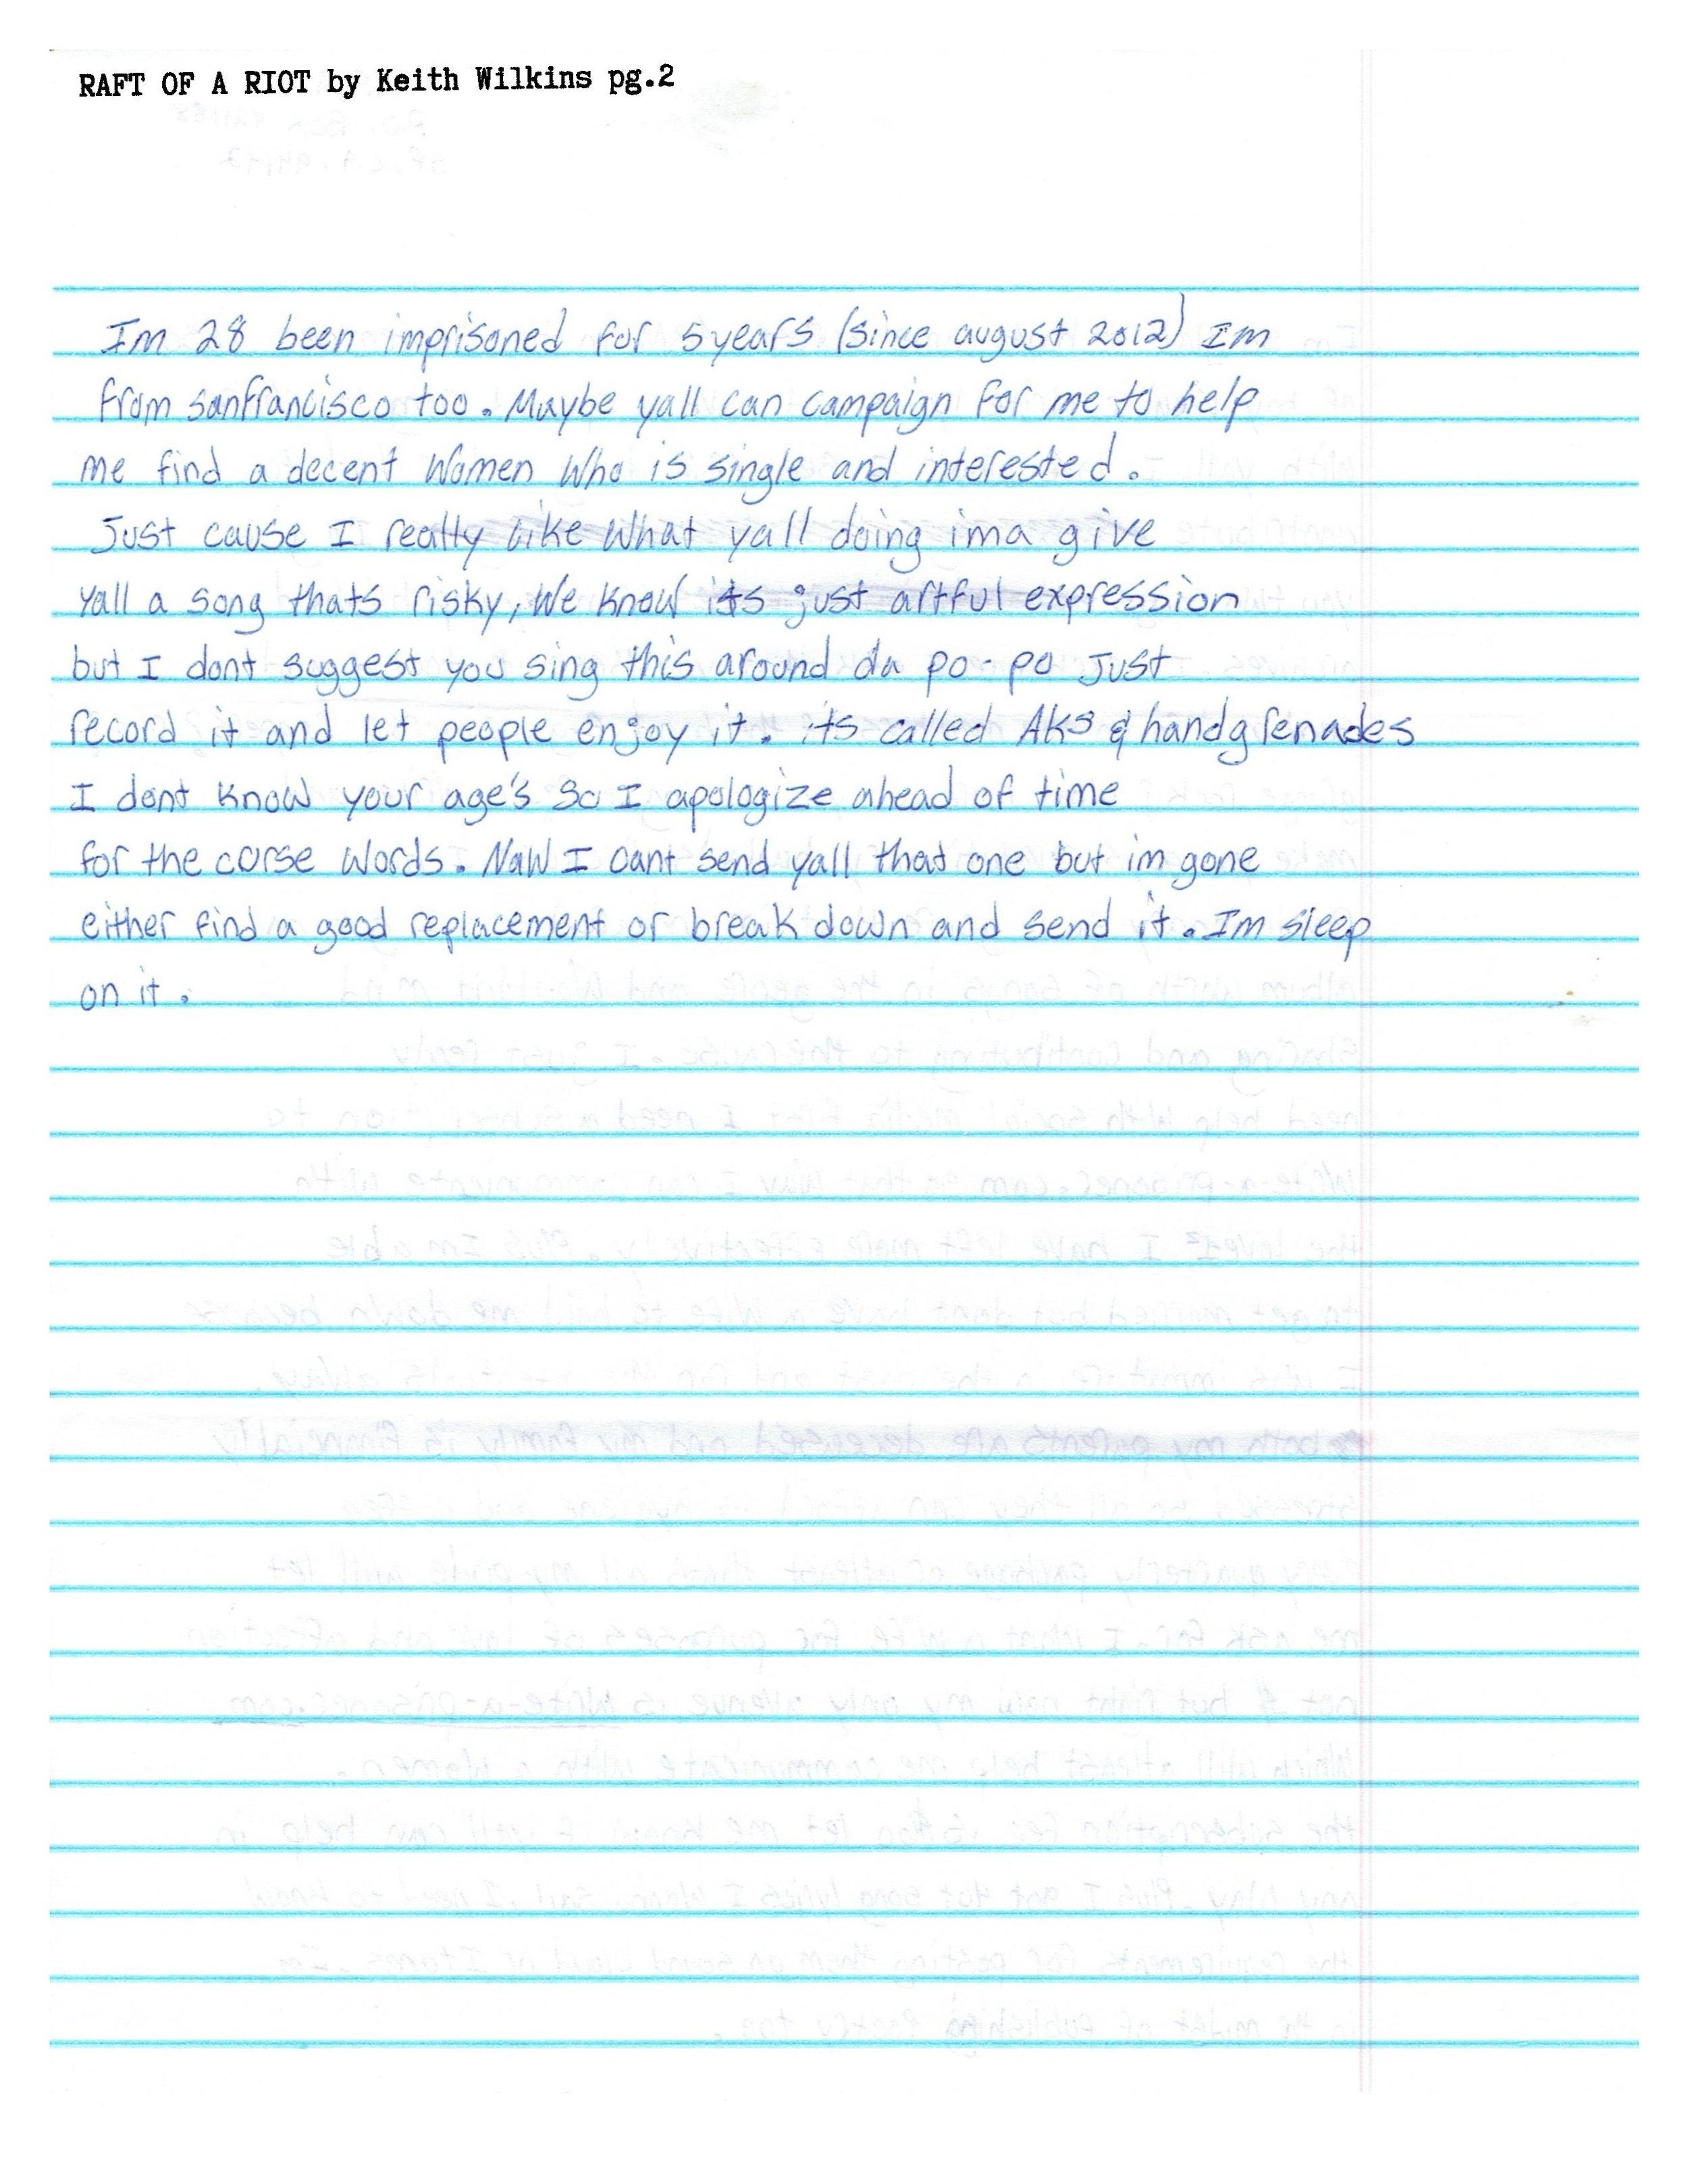 SLFH_vol_1-page-008.jpg